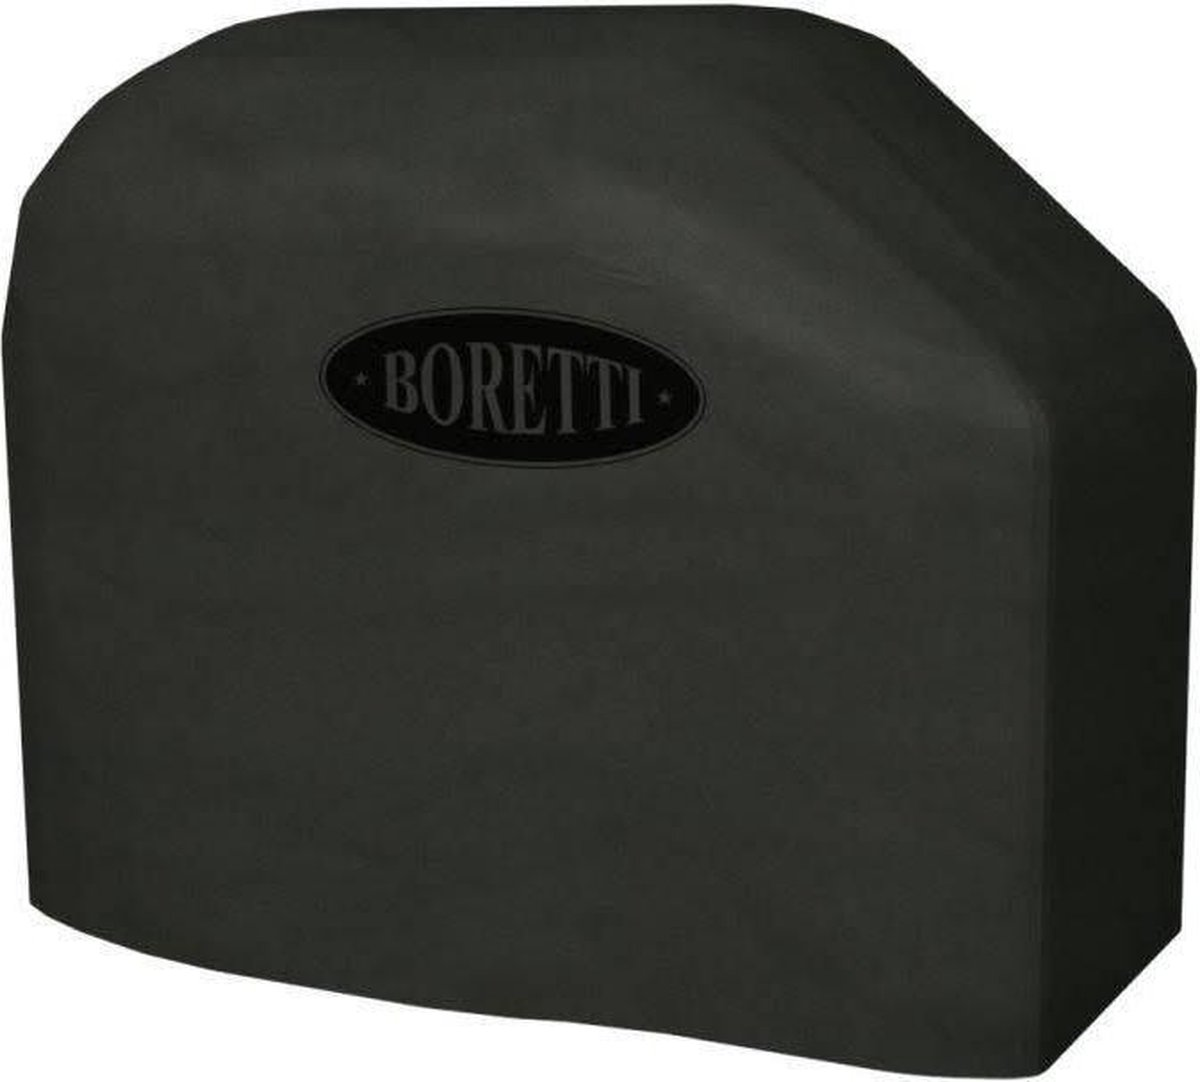 Boretti Carbone Hoes - Zwart